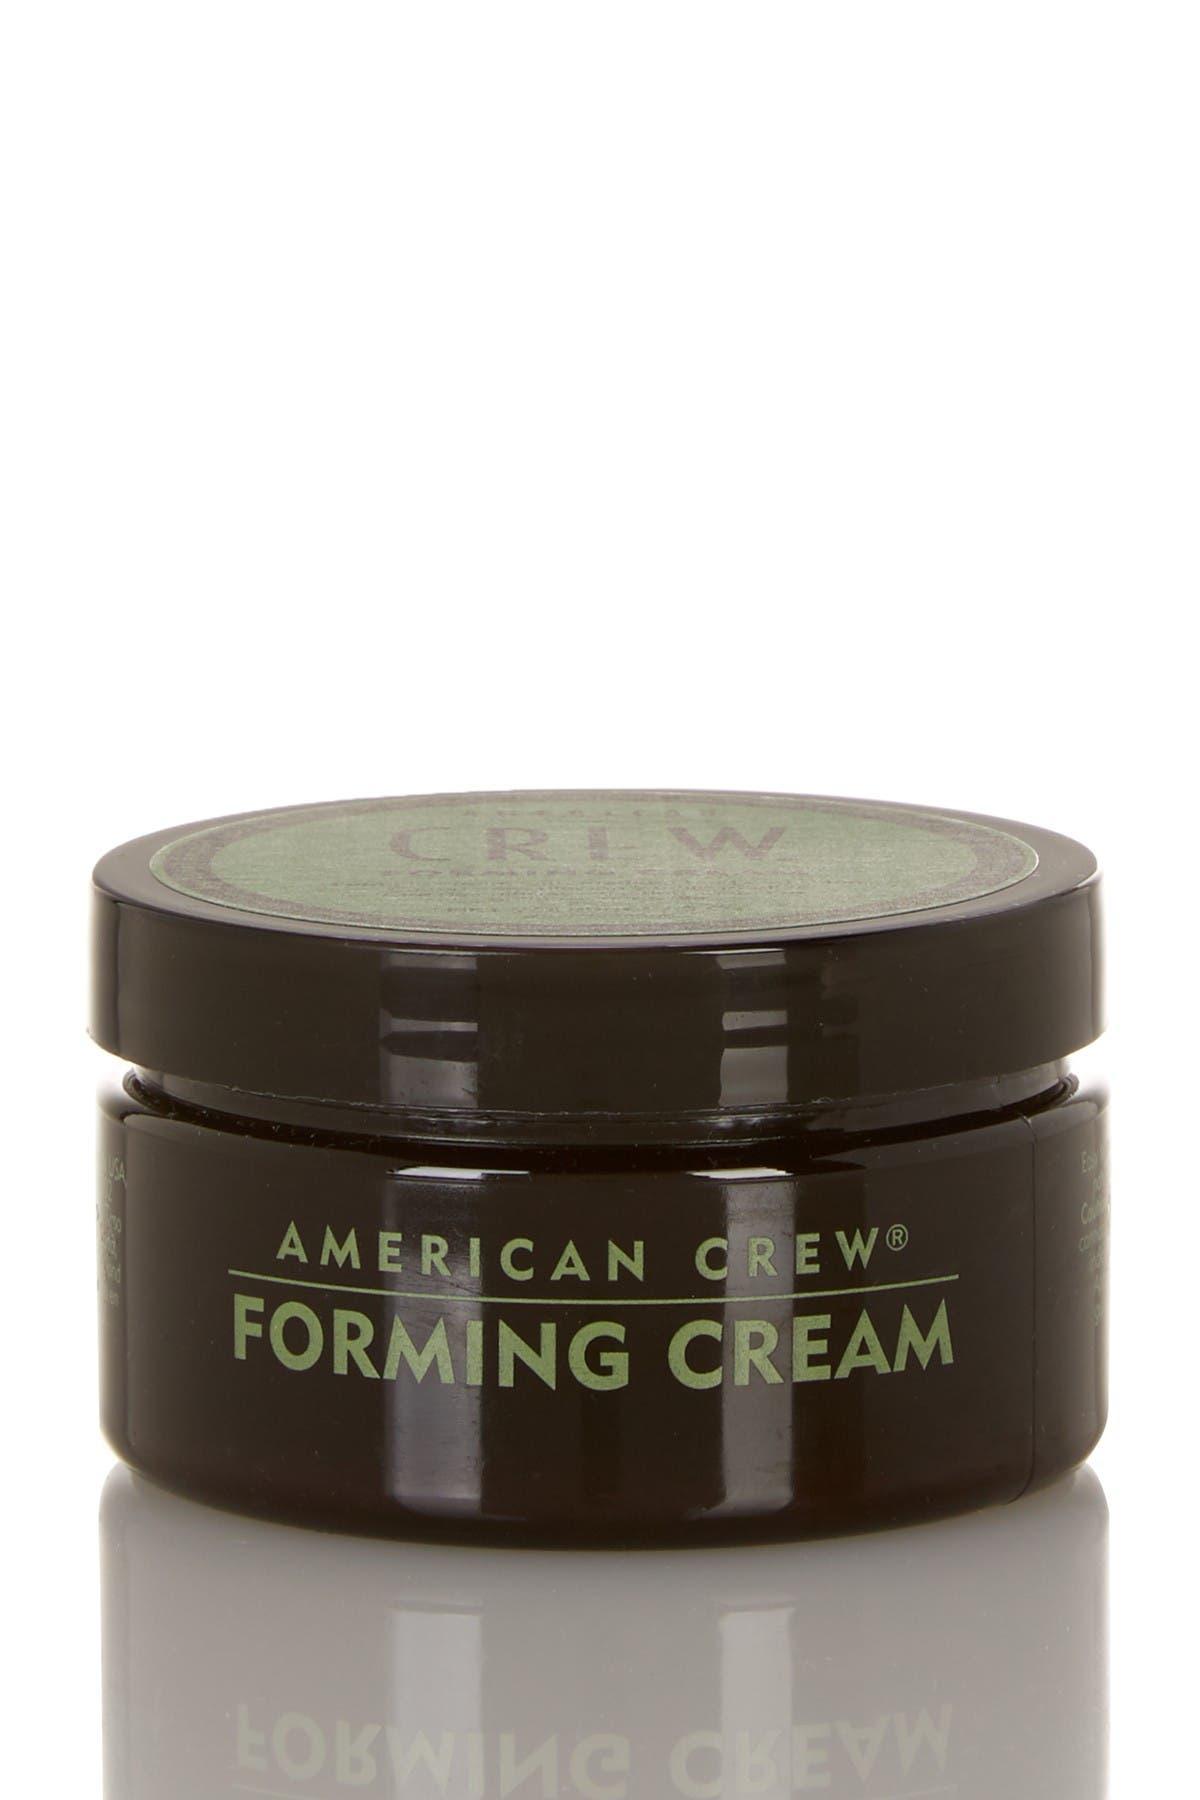 Image of American Crew - Forming Creme 3 oz.